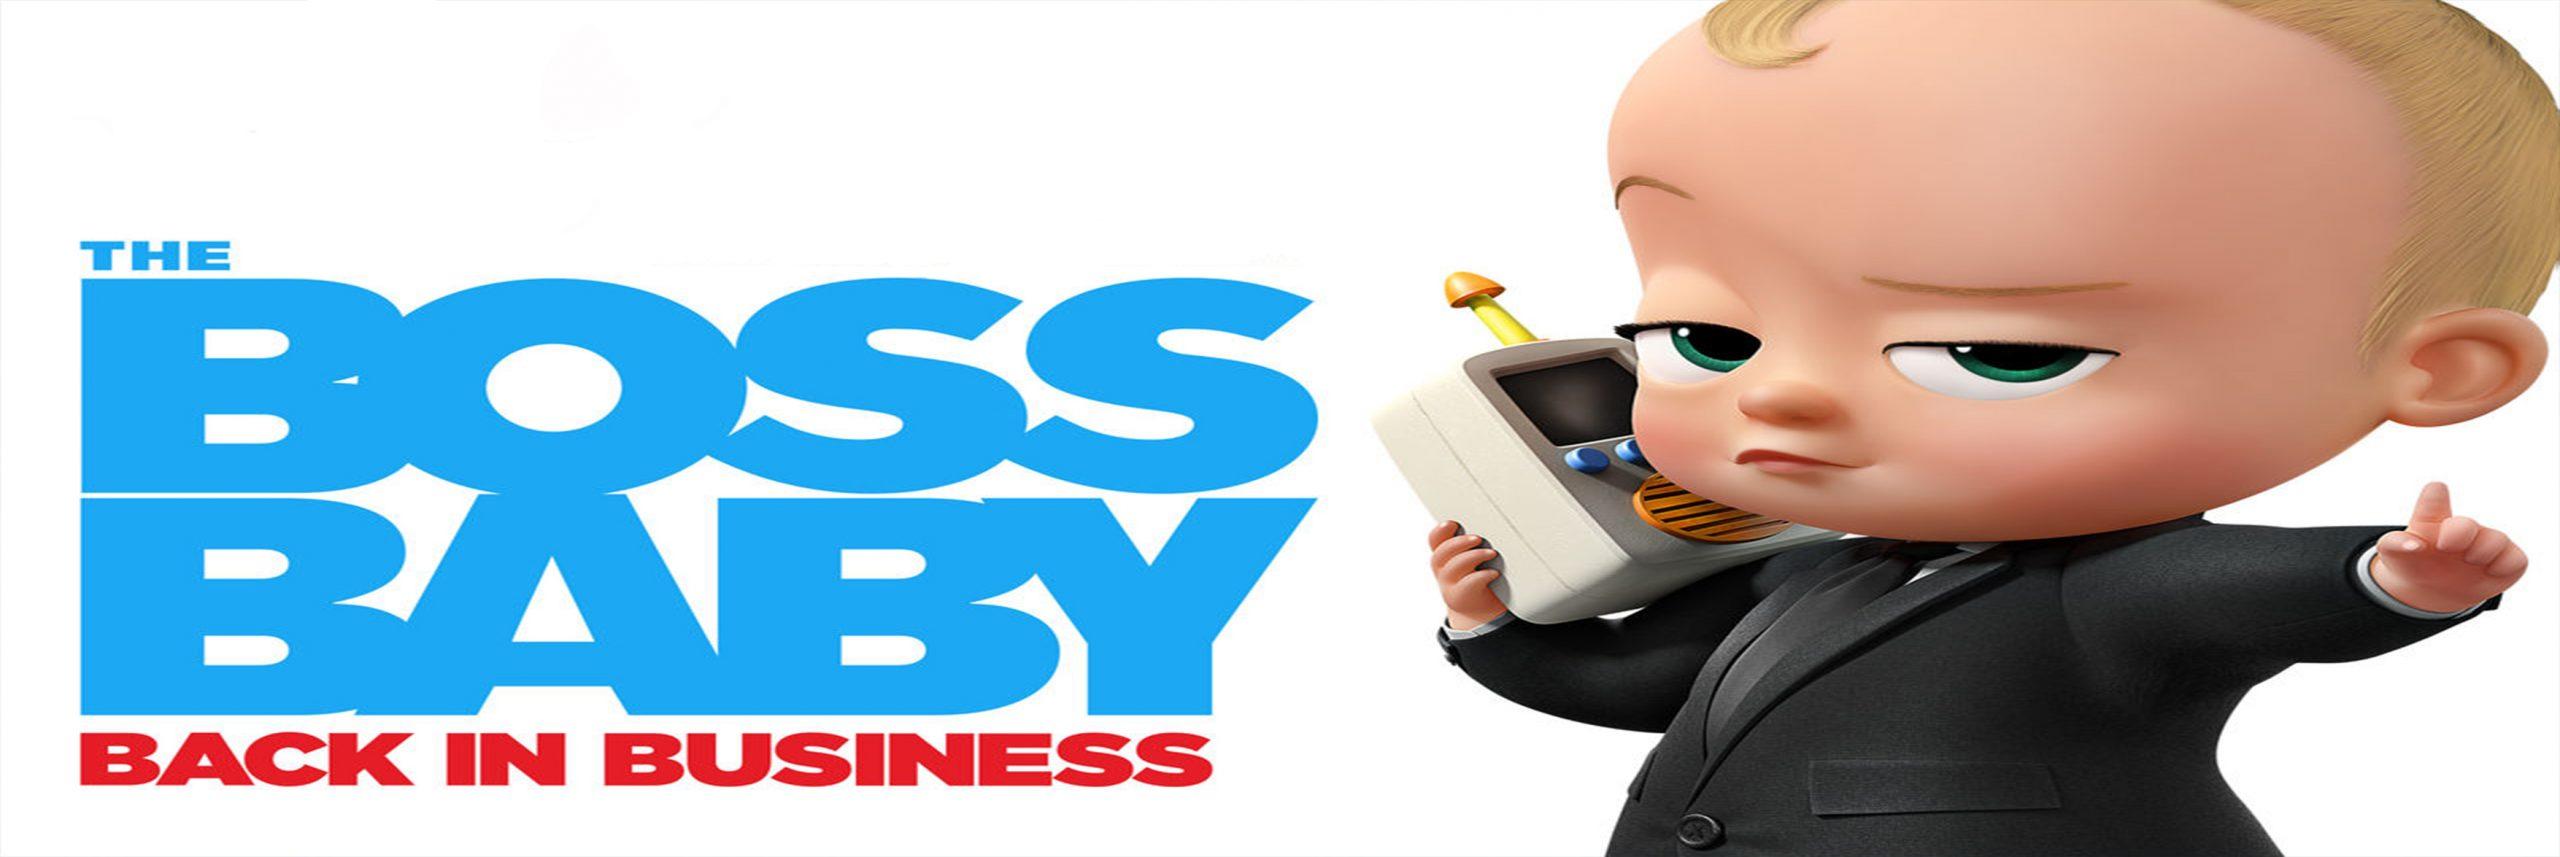 بچه رئیس : بازگشت به کار – The Boss Baby : Back In Business